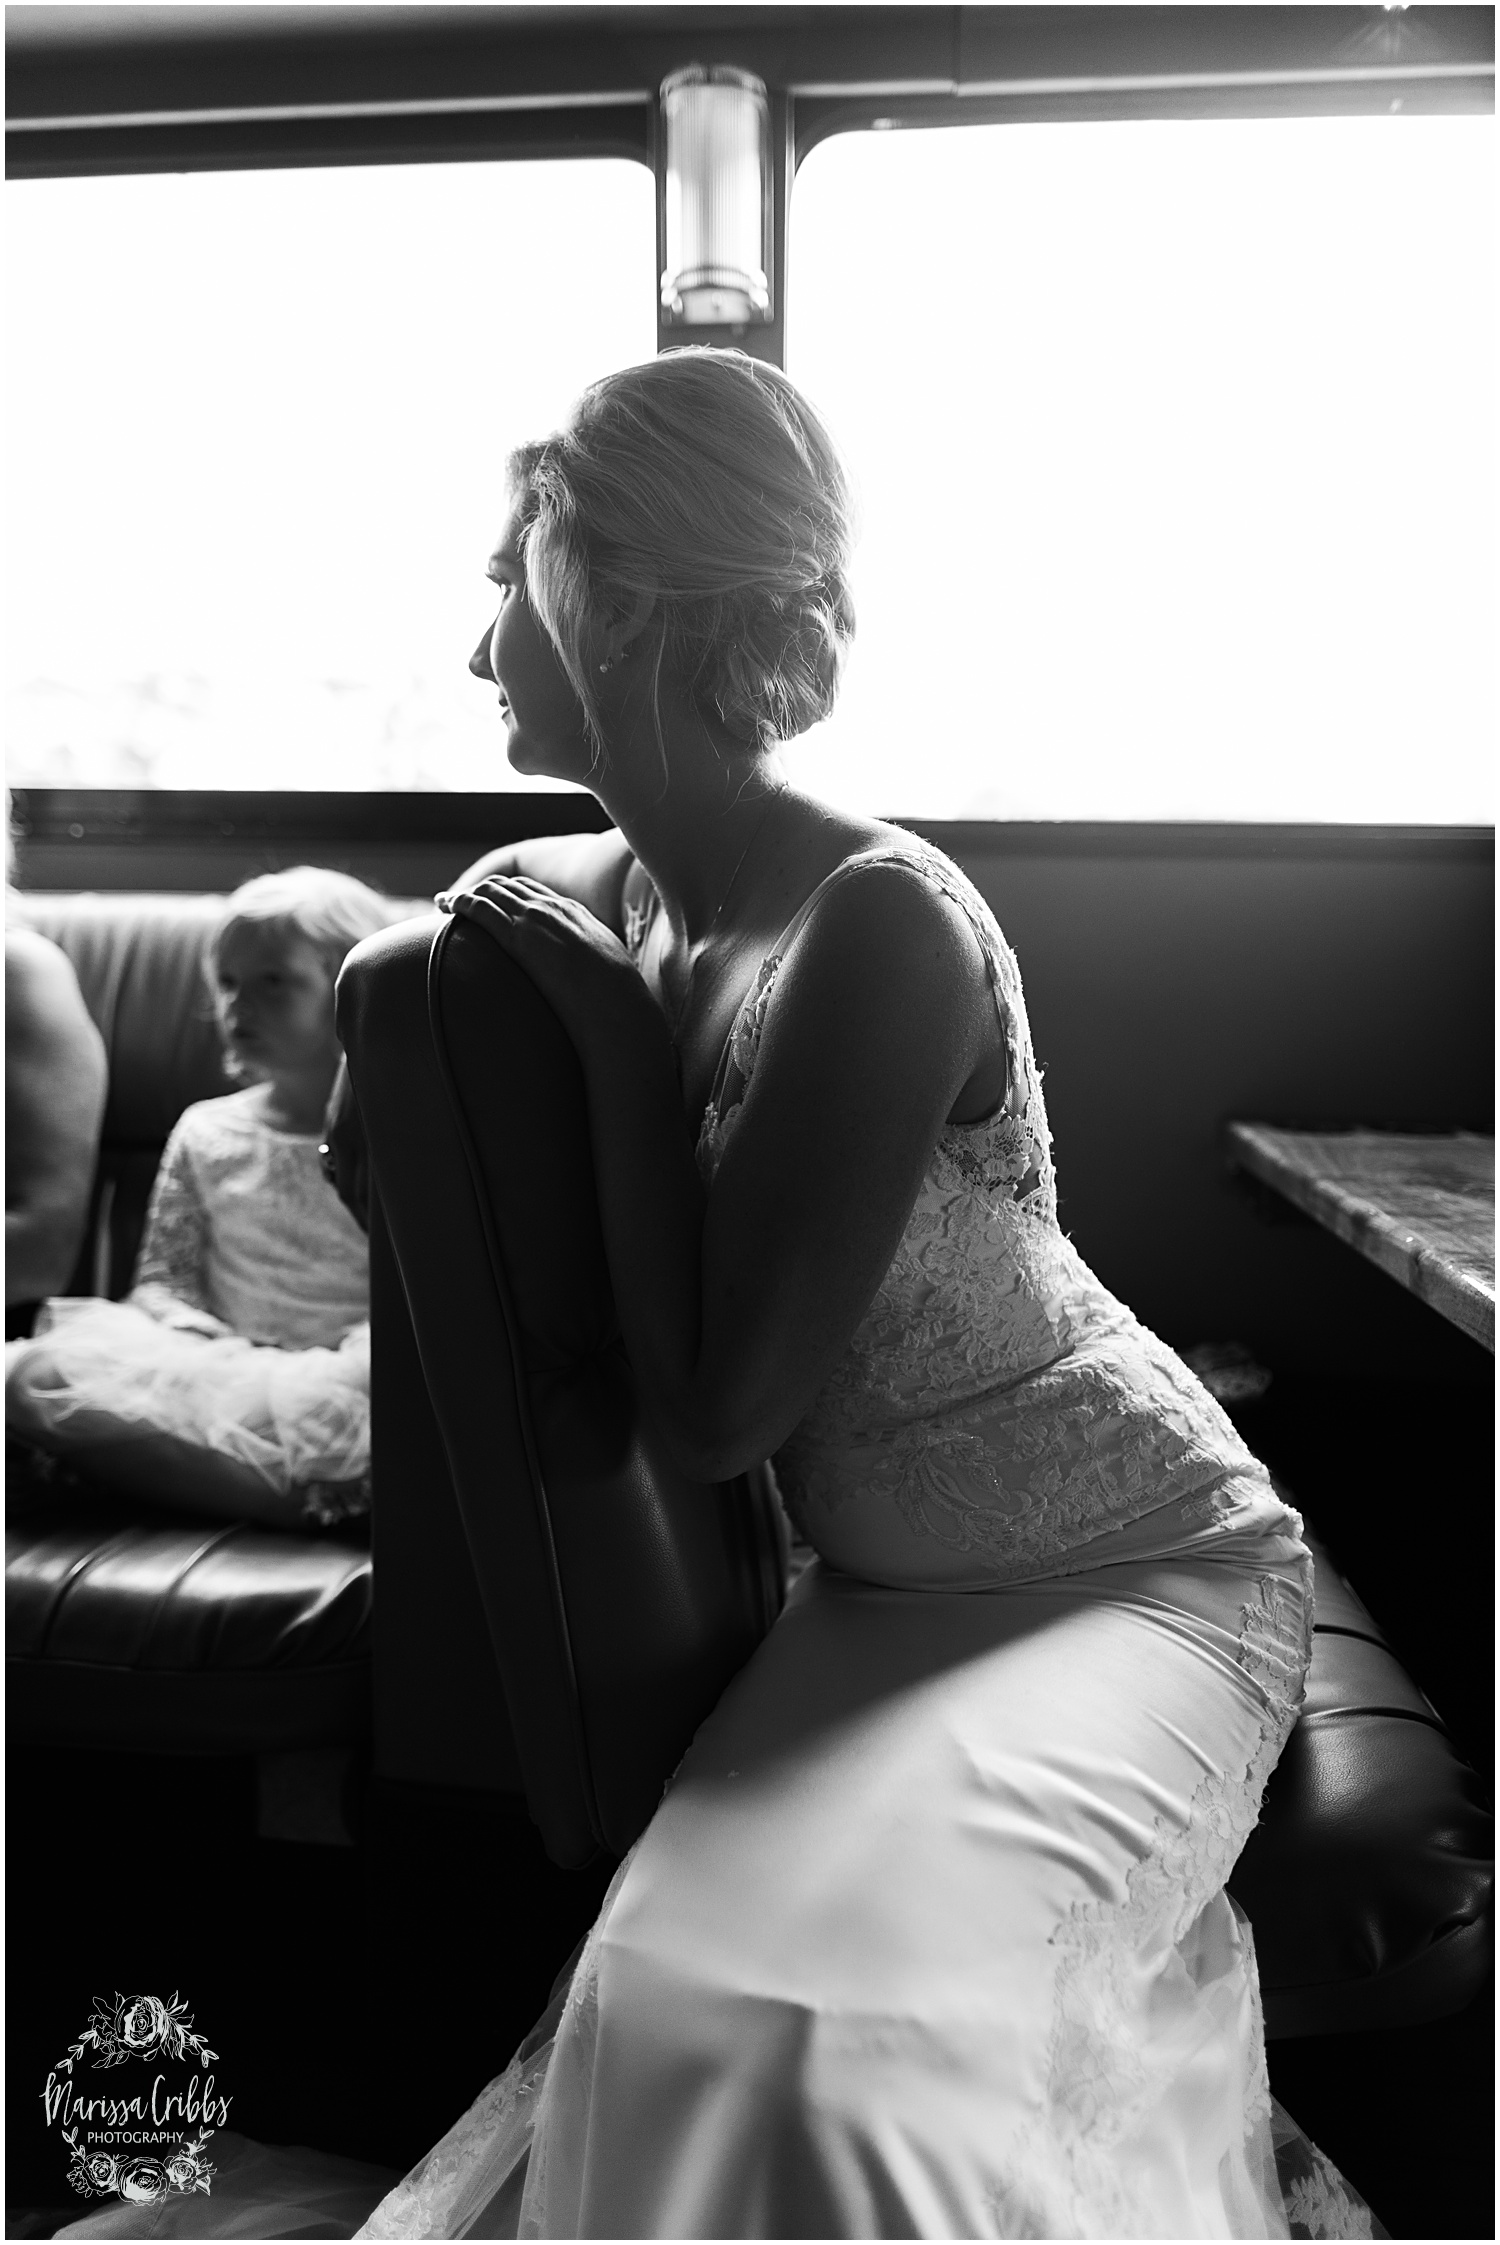 CHELSEA & BEN MARRIED BLOG  | MARISSA CRIBBS PHOTOGRAPHY_8506.jpg